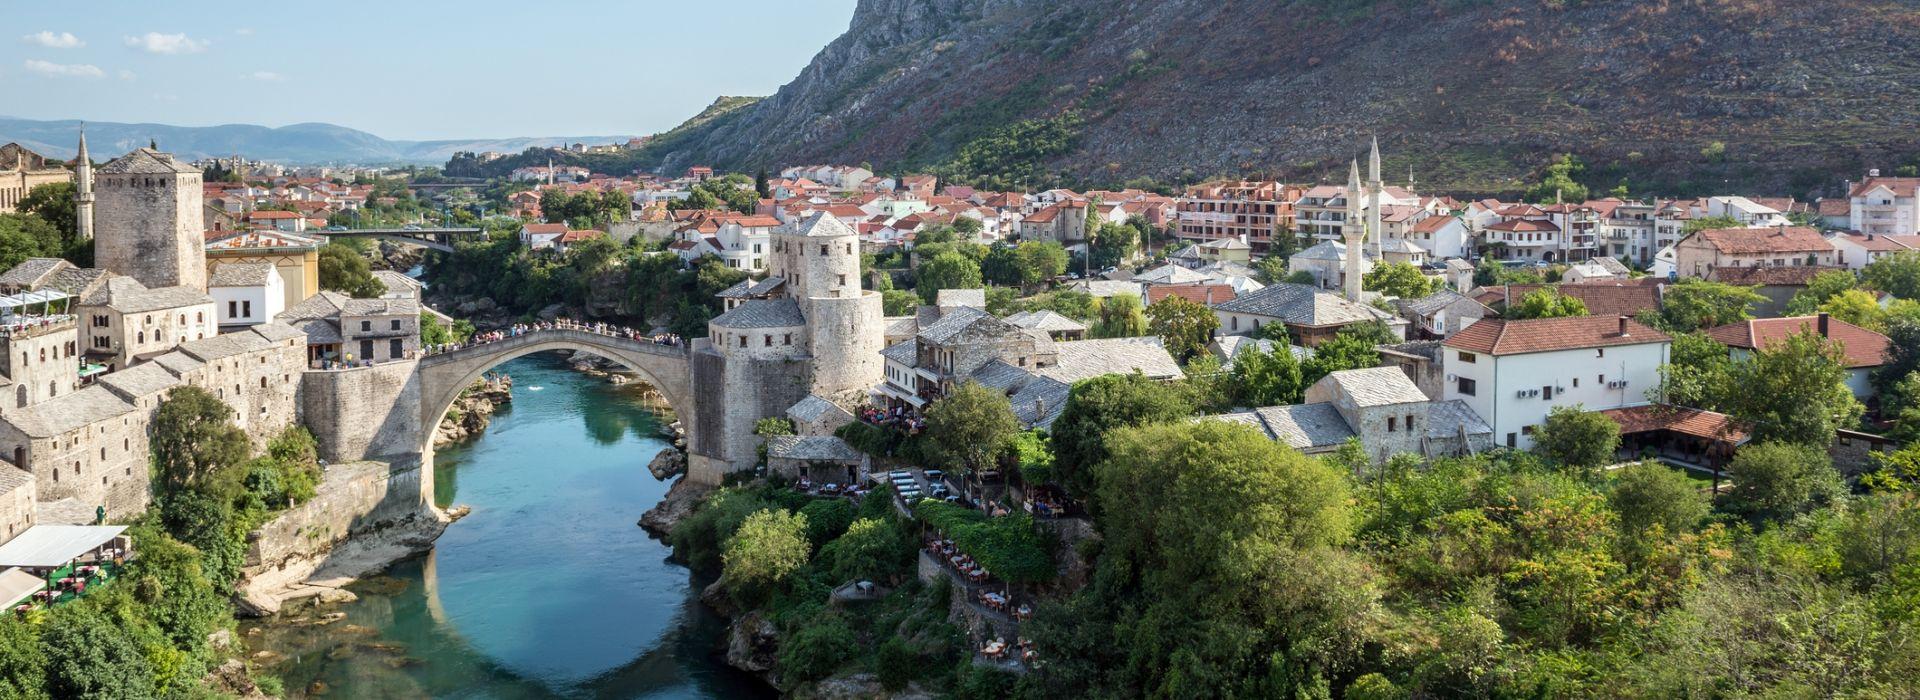 Travelling Bosnia Herzegovina – Tours and Trips in Bosnia Herzegovina